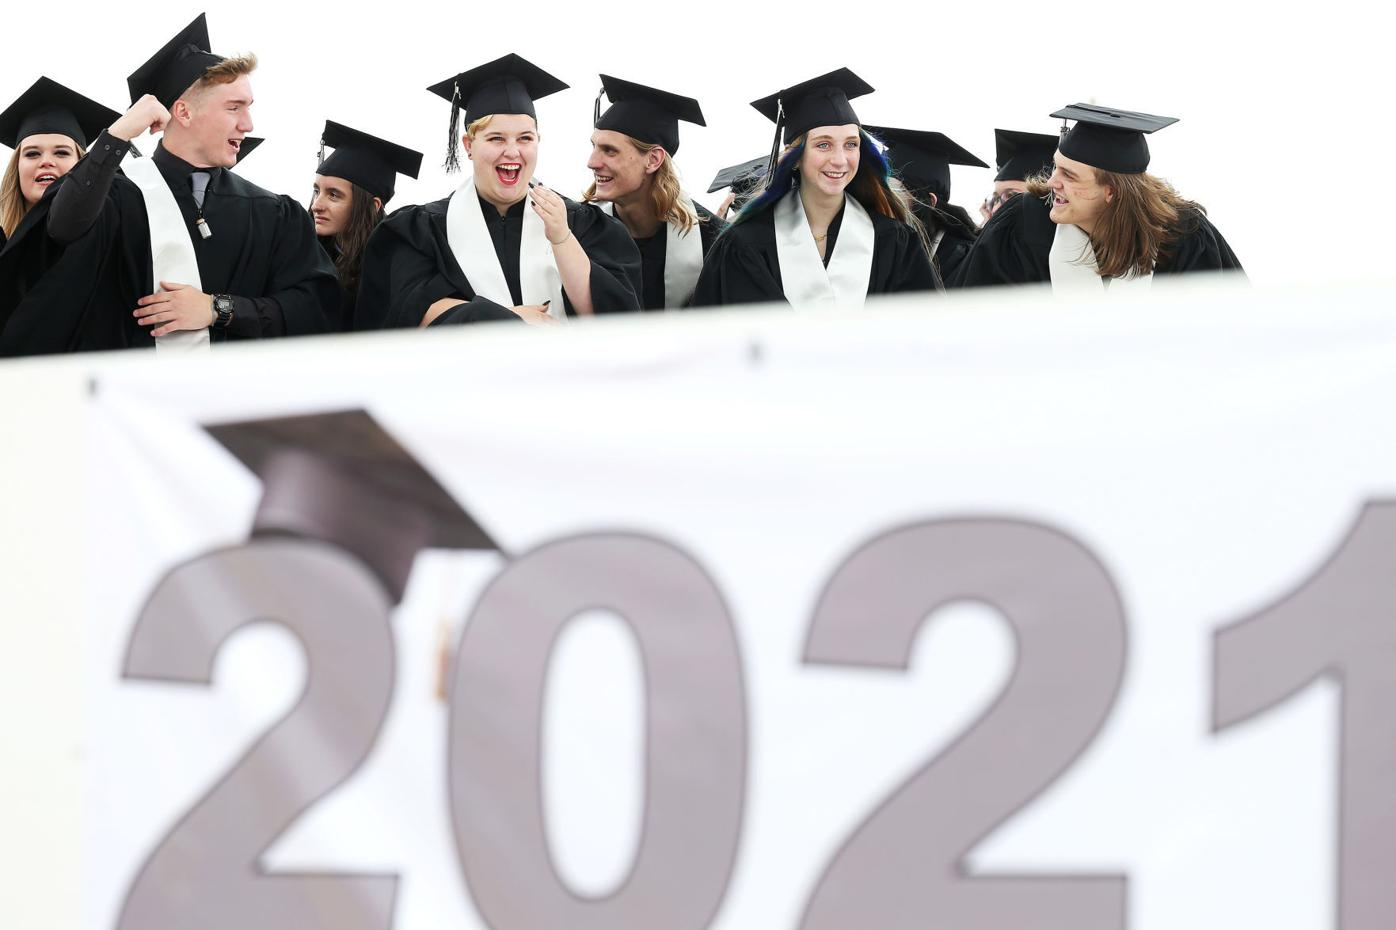 20210527-news-triumphgrad-mc-1.JPG